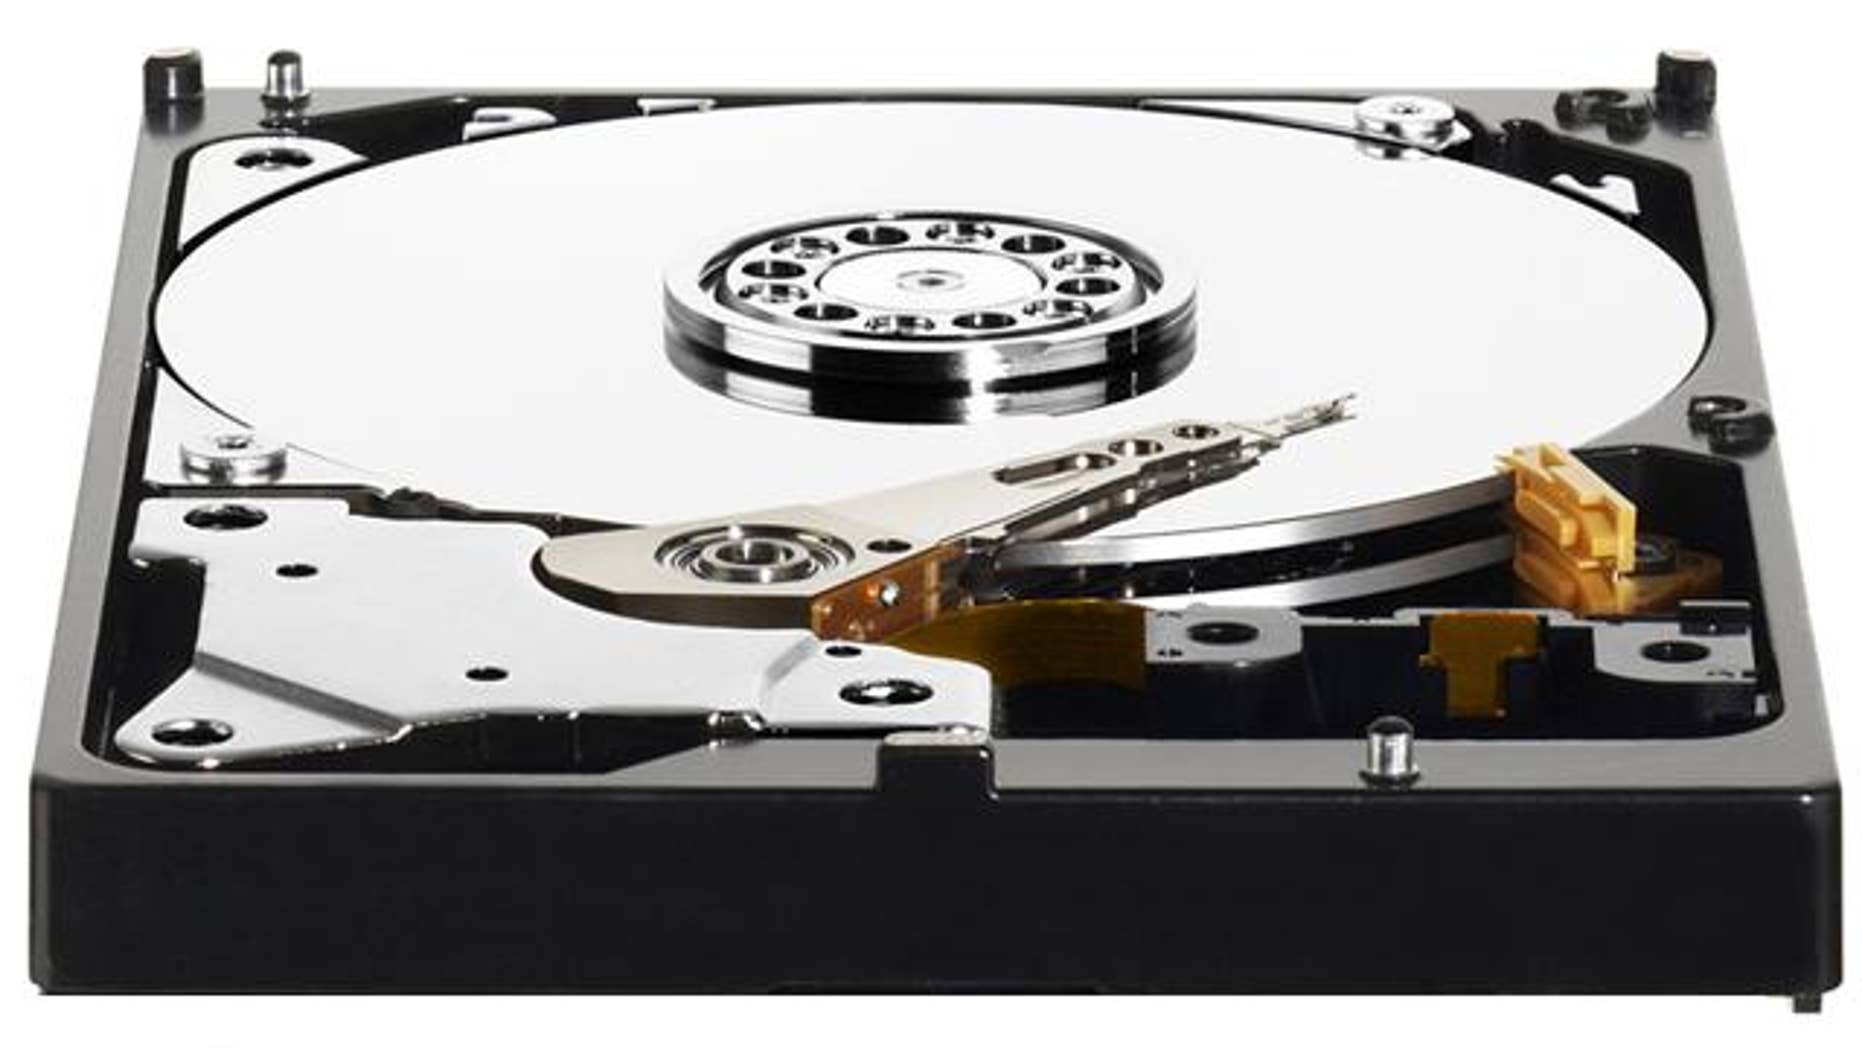 The Caviar Green hard disk drive from Western Digital.